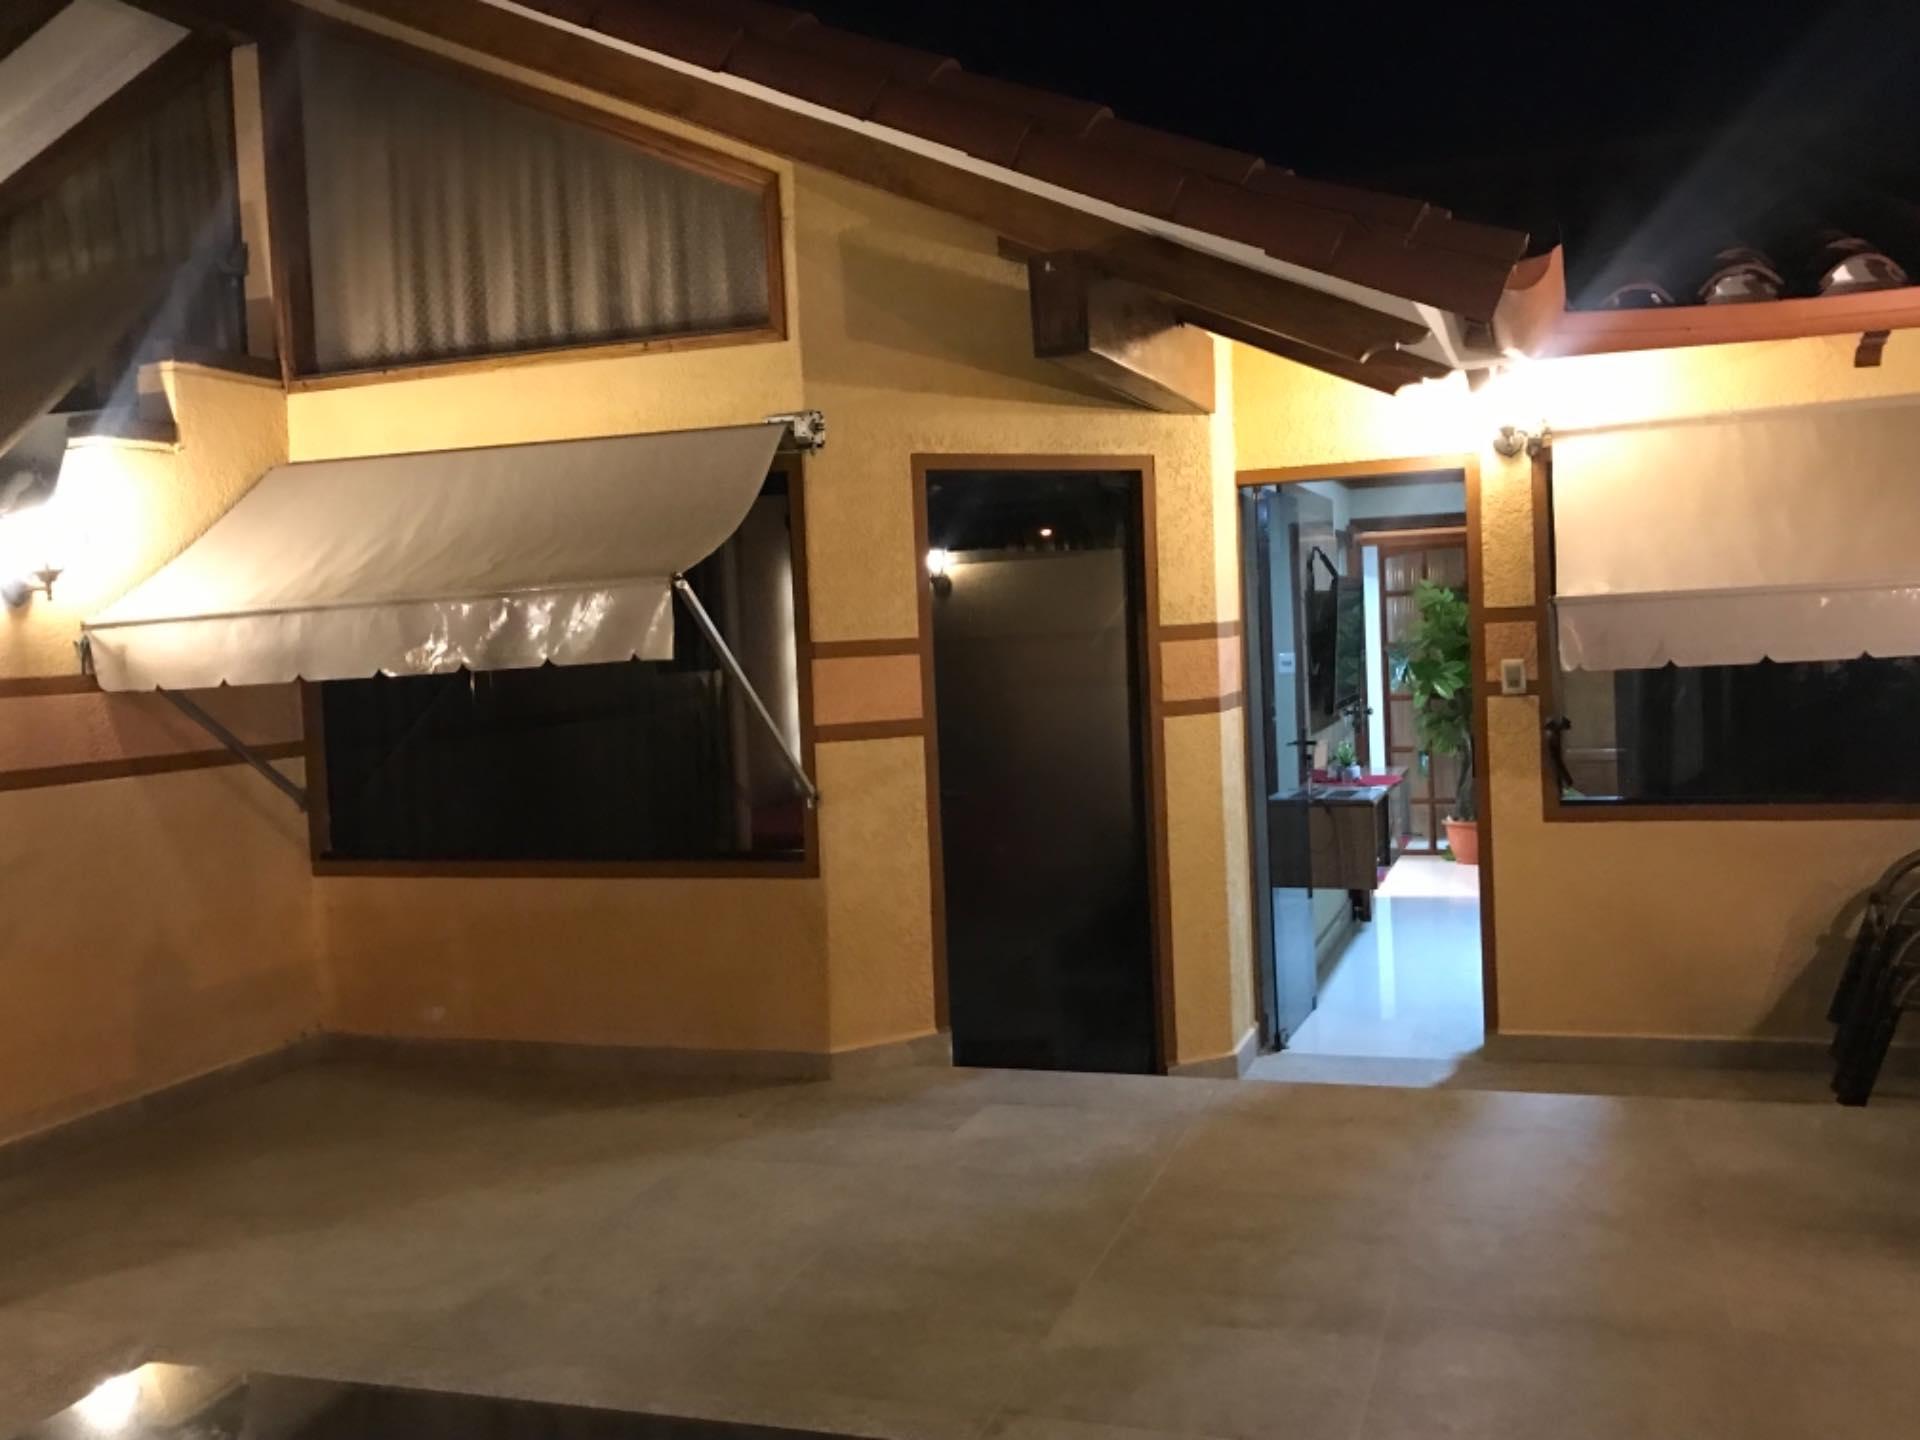 Casa en Venta Sobre avenida Santos Dumont entre 2do y 3er anilllo  Foto 17